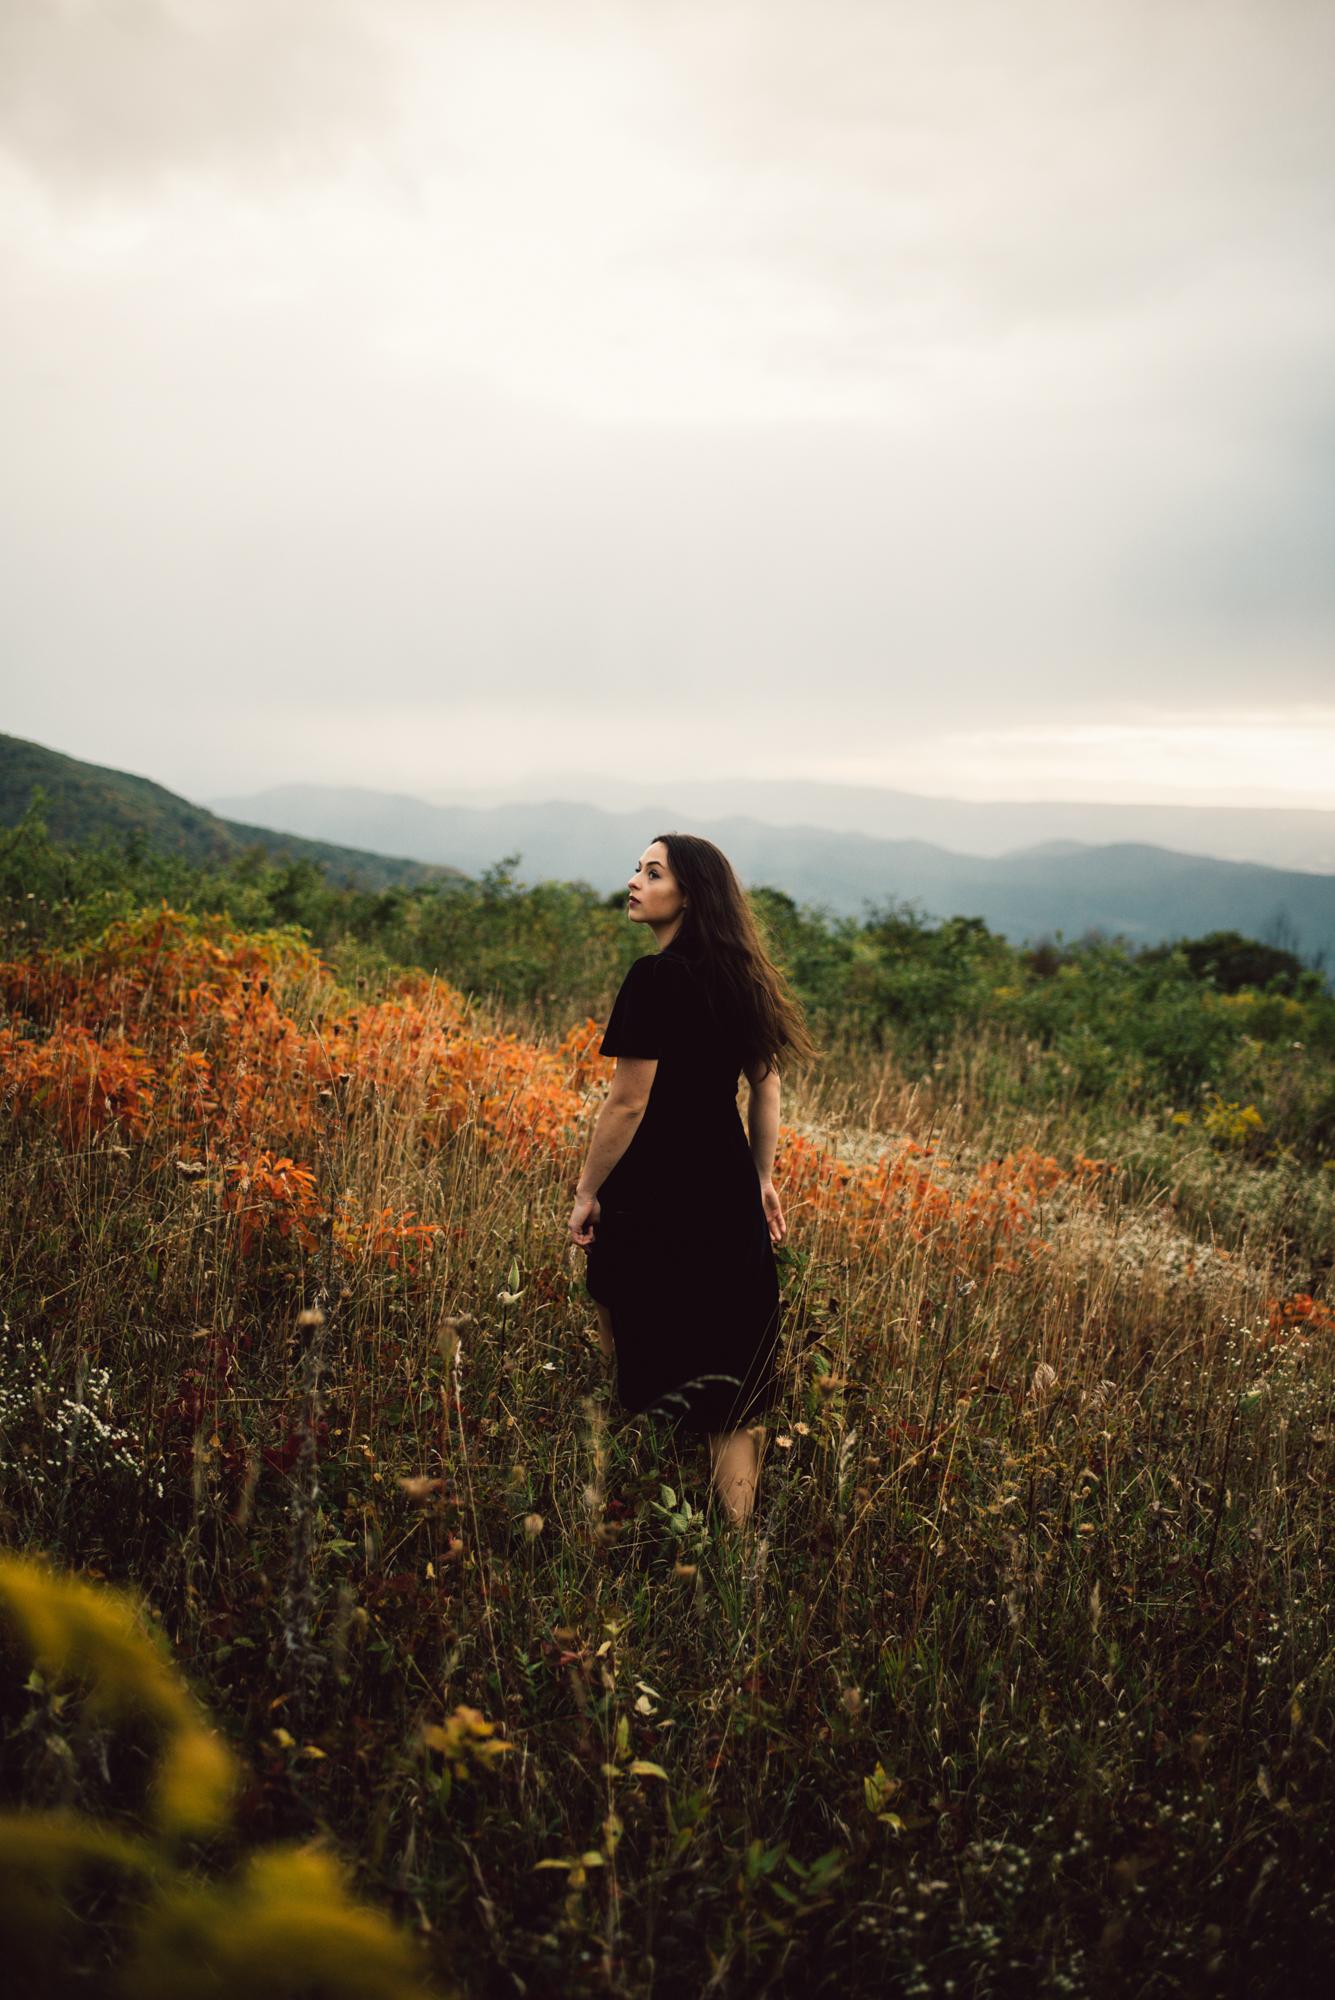 Megan_Shenandoah_National_Park_Windy_Romantic_Portraits_144.JPG